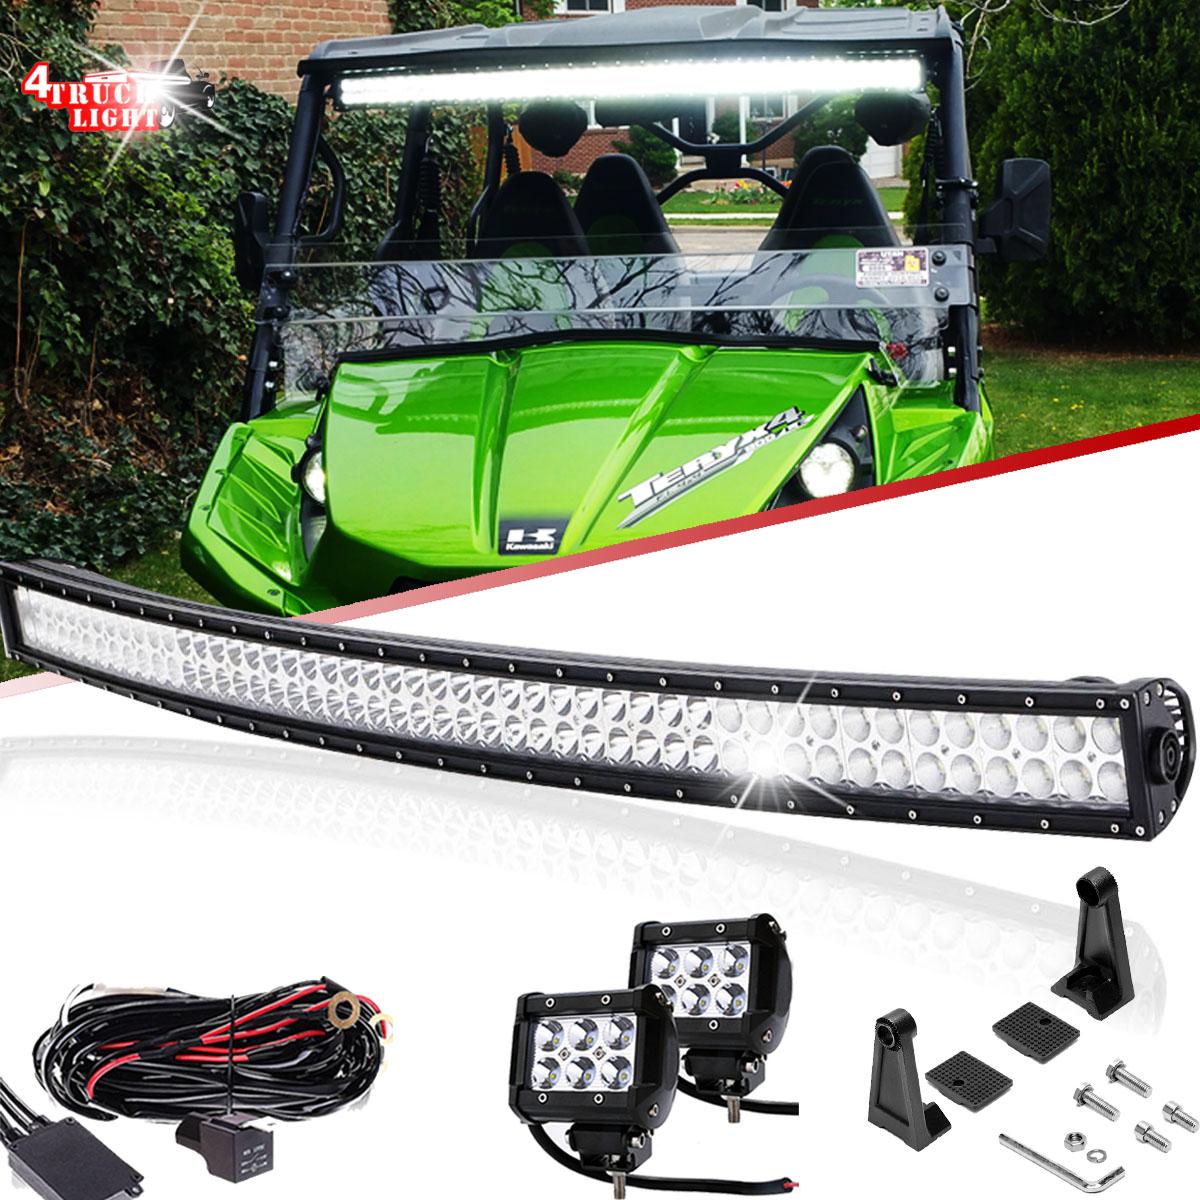 For Kawasaki Teryx Teryx4 Mule 610 4010 Utv Upper Curved 50 Led Electrical Wiring Harness Bar 2x 4 Pods